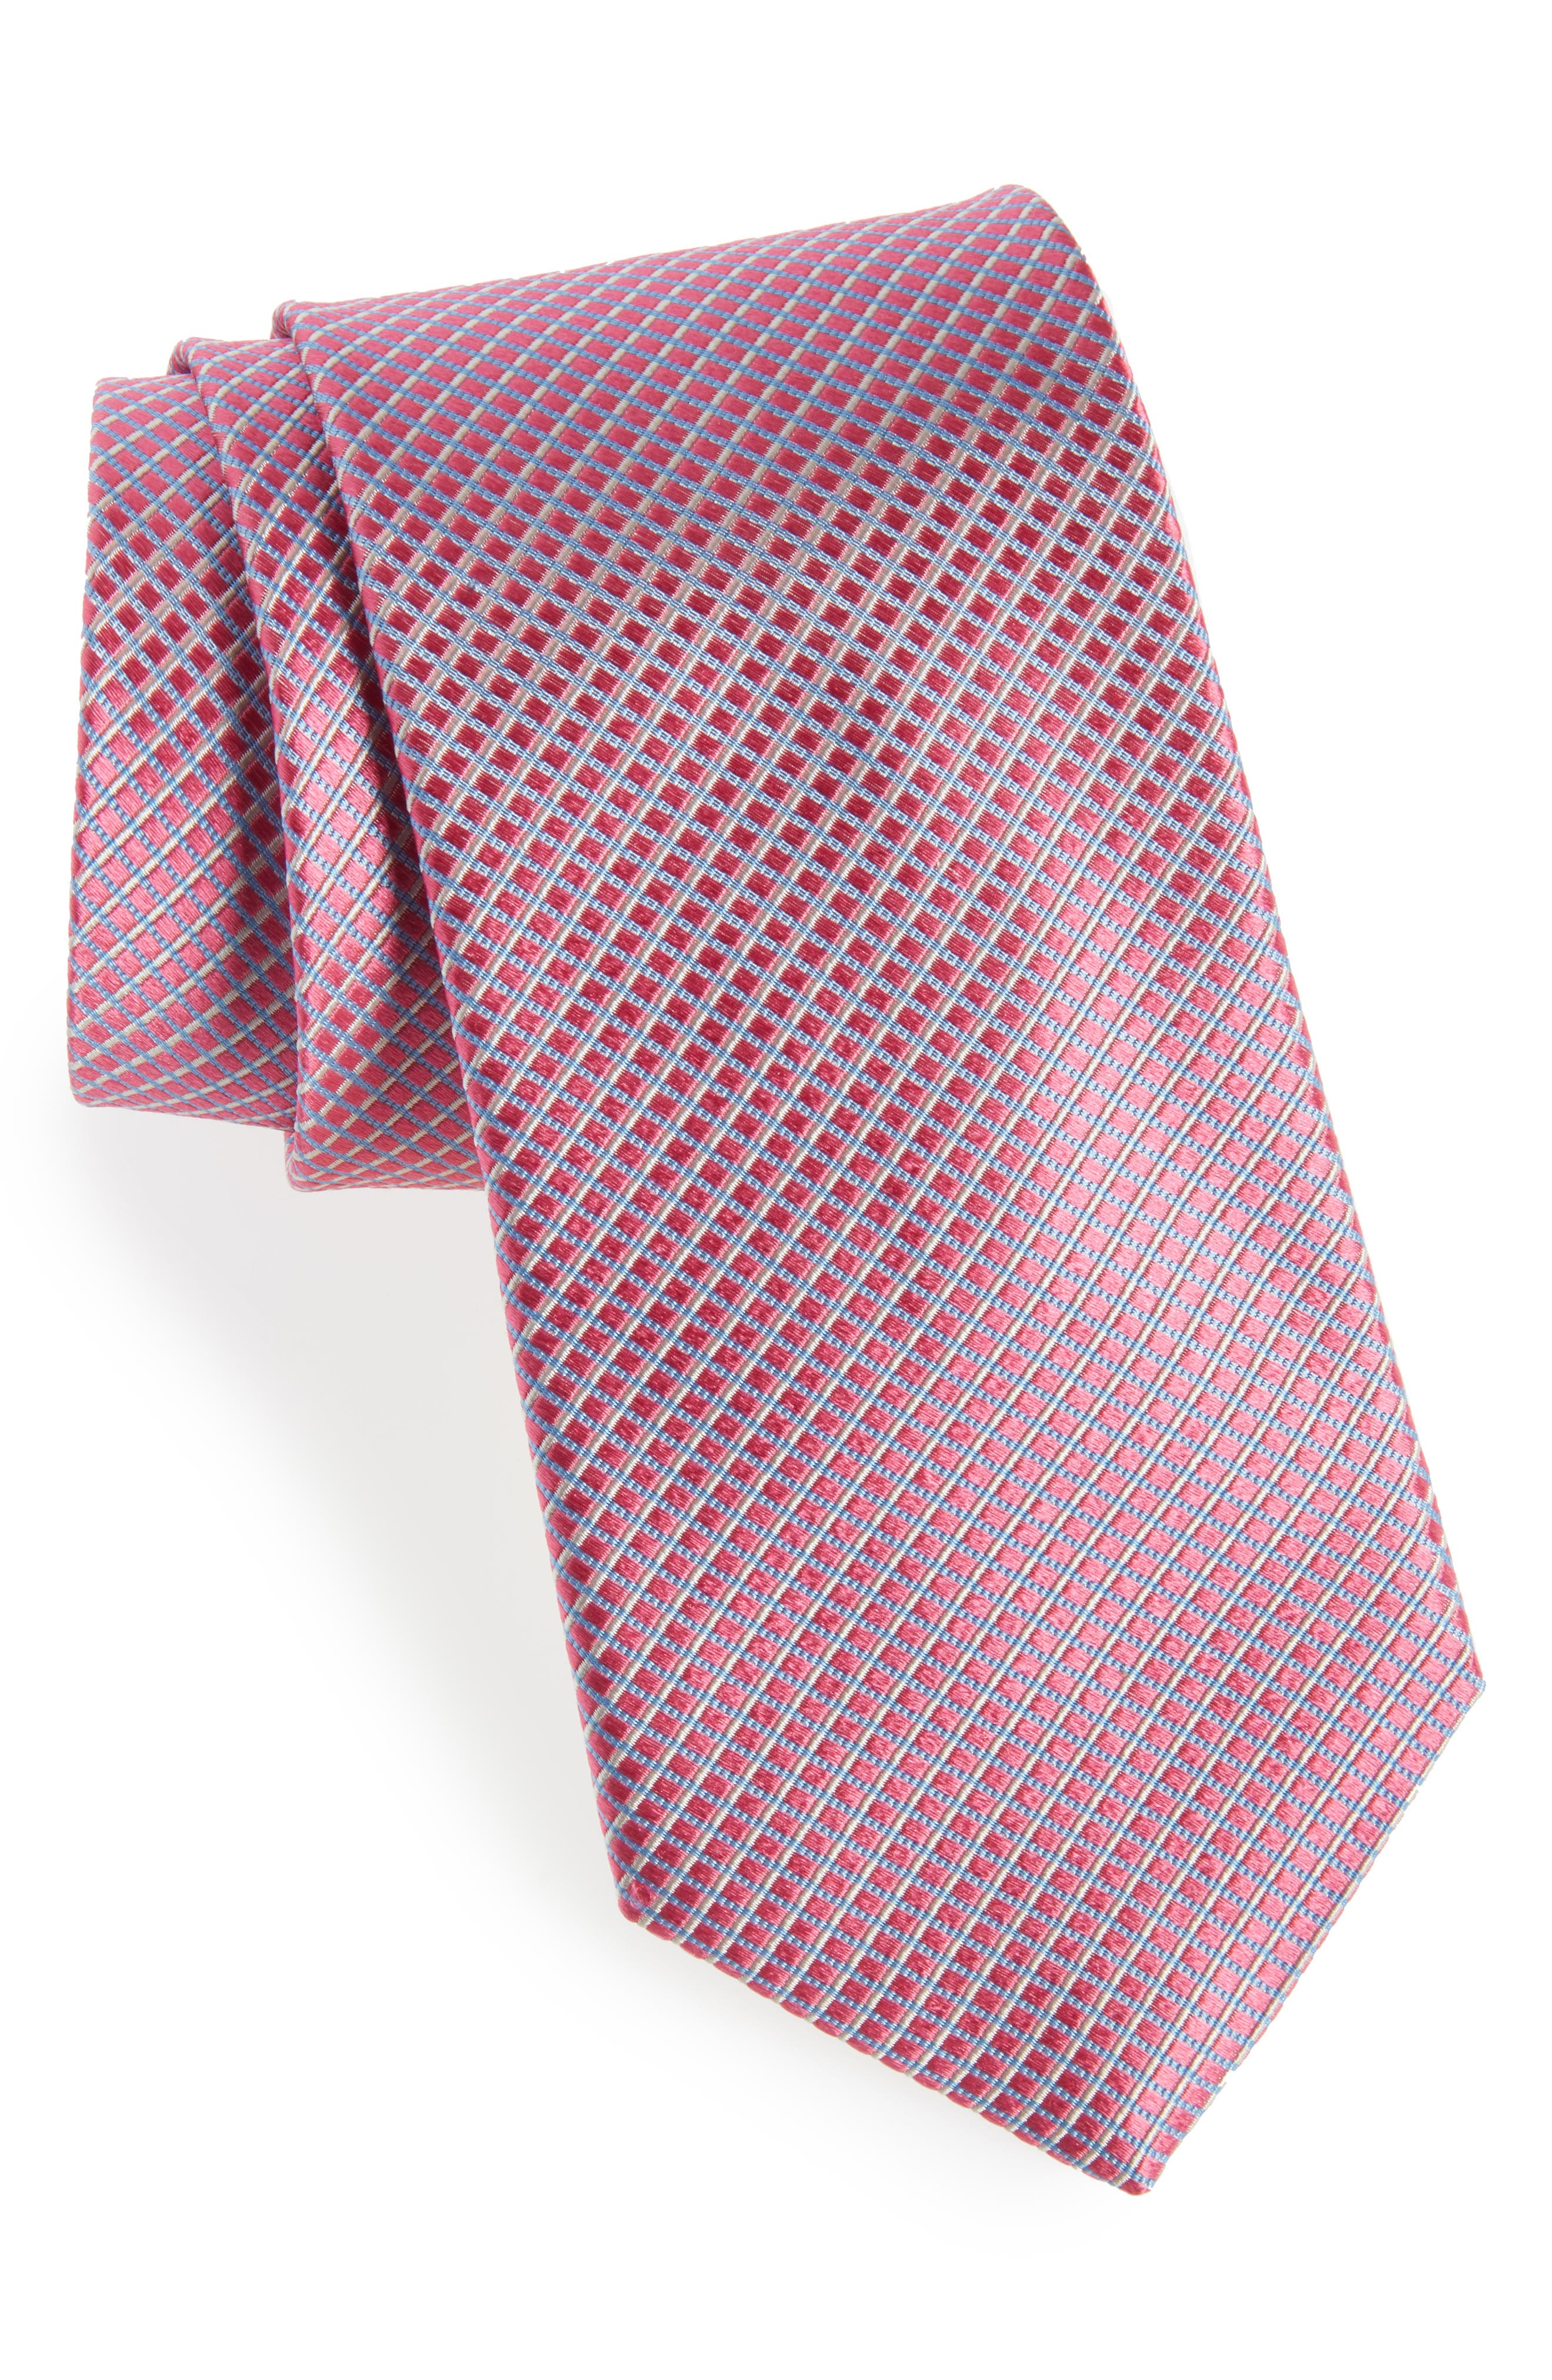 Bucaro Micro Pattern Silk Tie,                             Main thumbnail 1, color,                             PINK